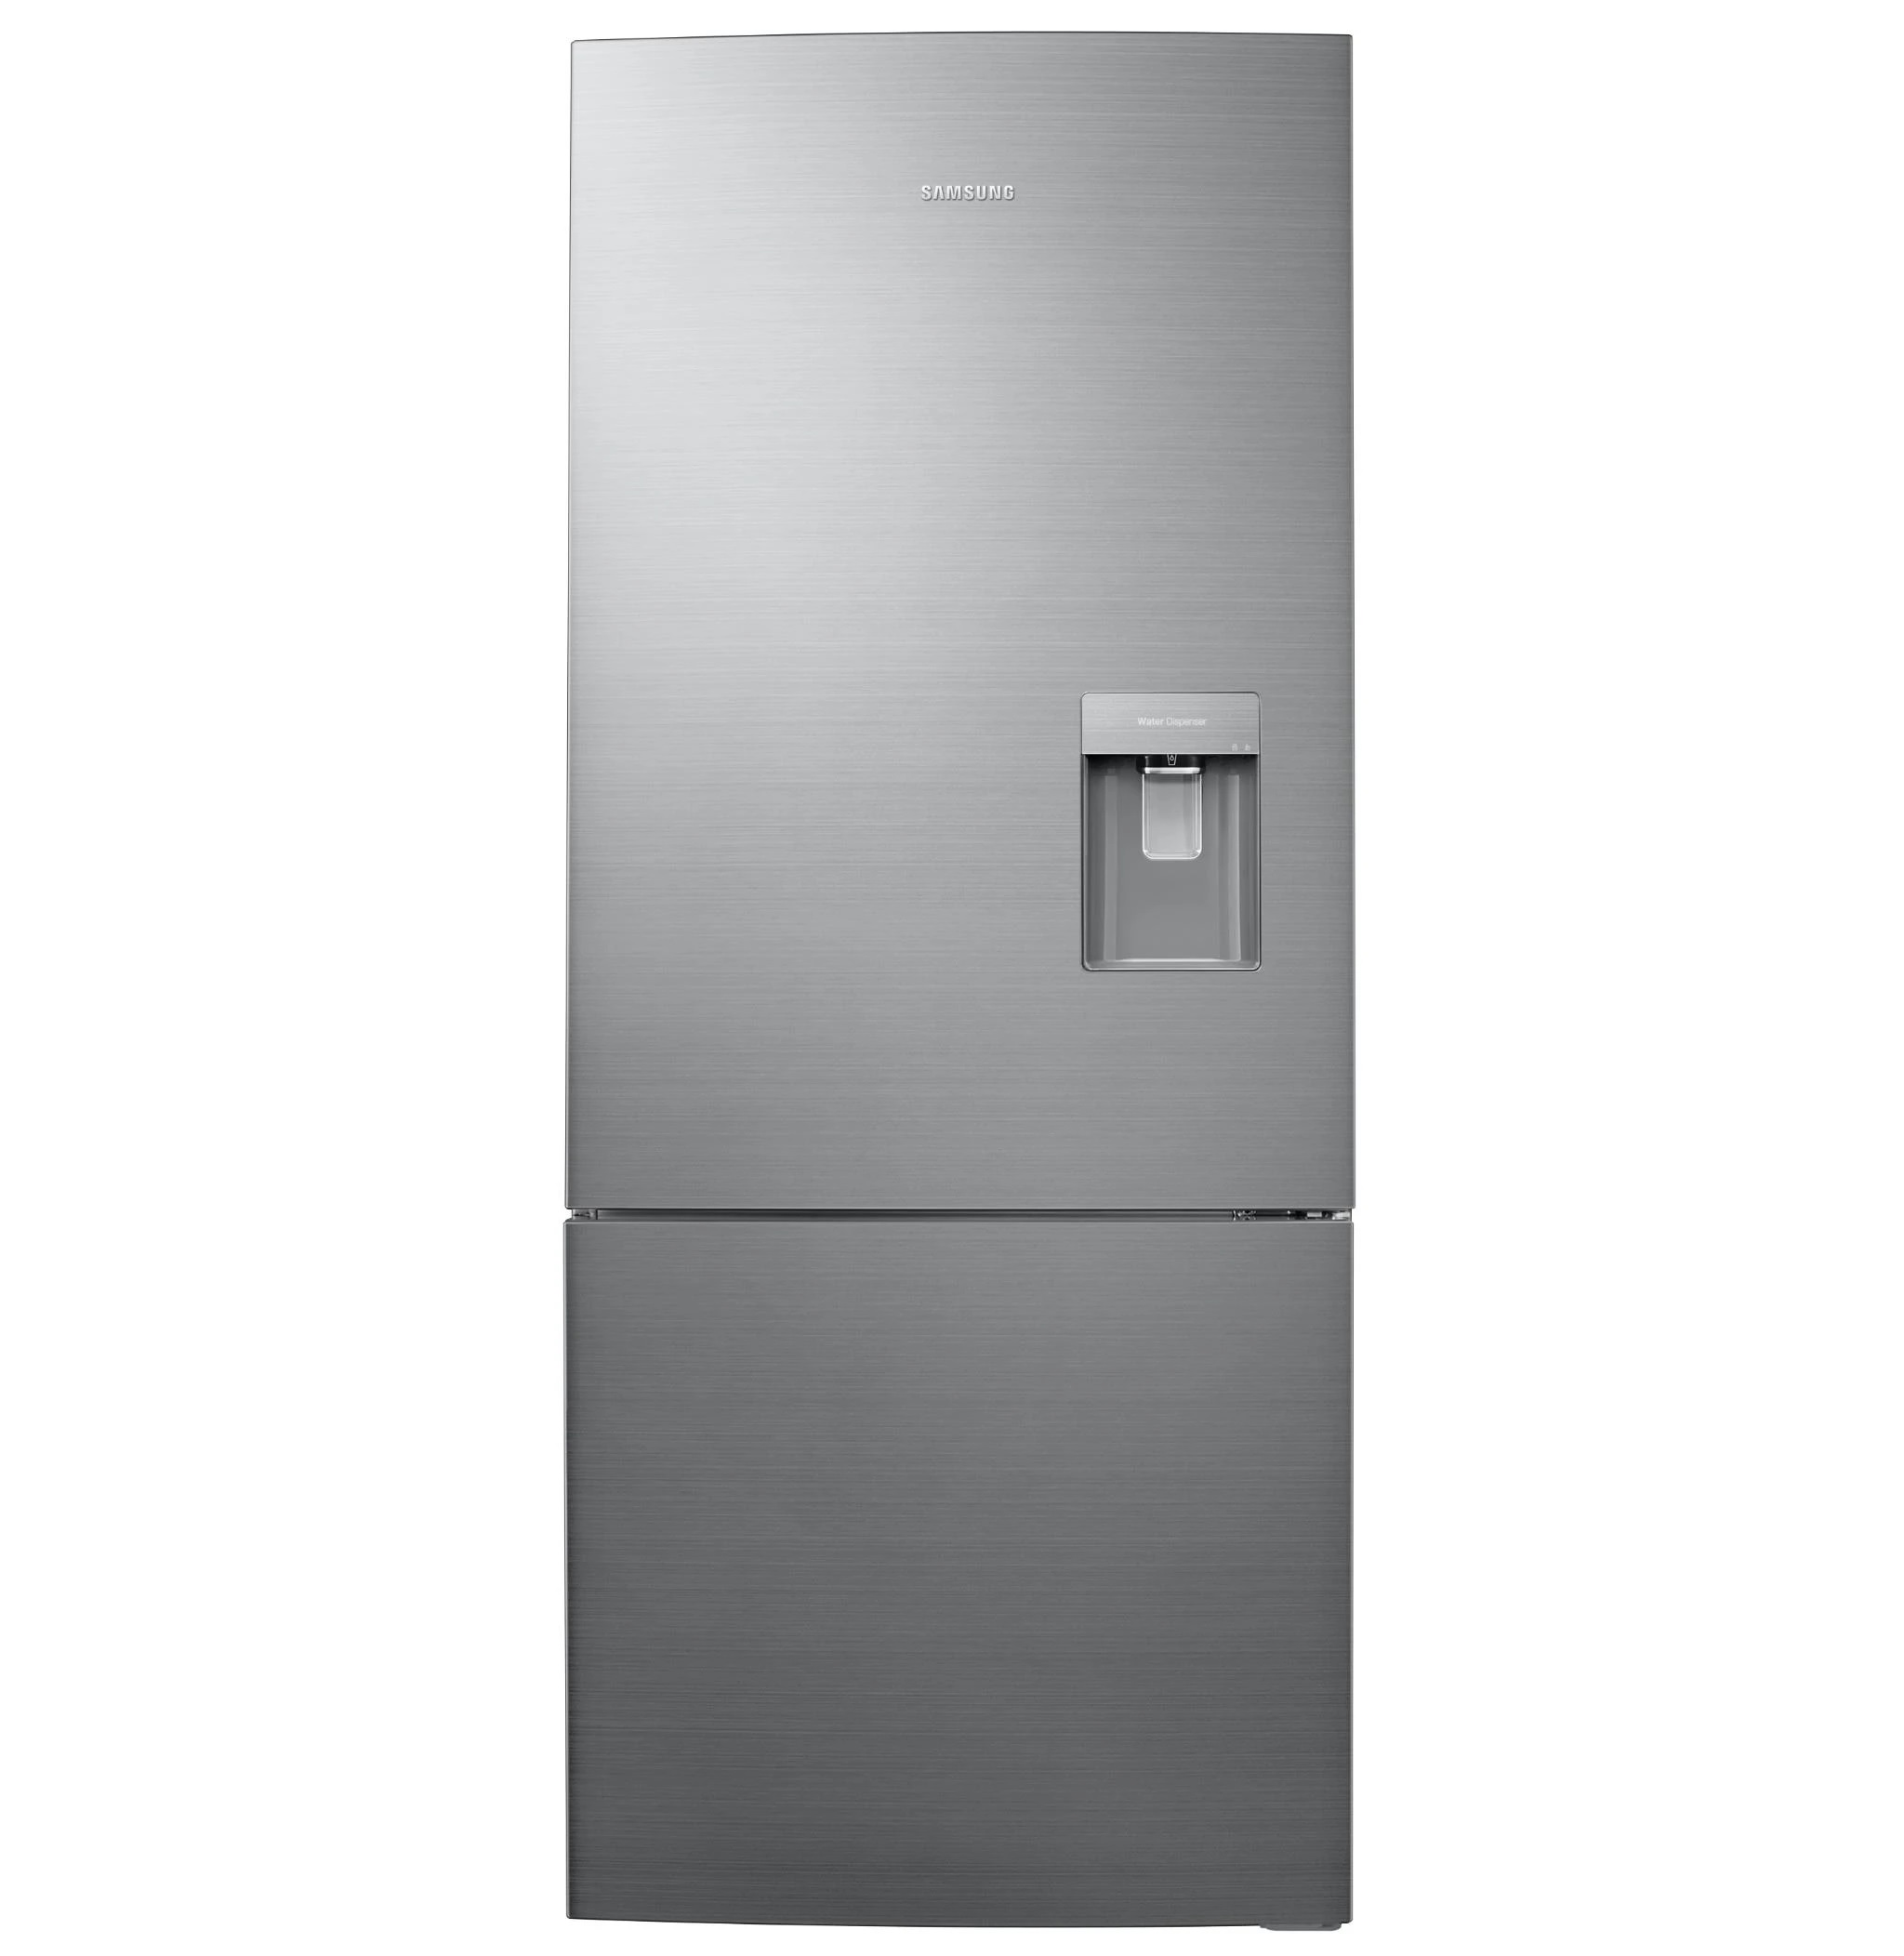 Samsung SRL446DLS Refrigerator